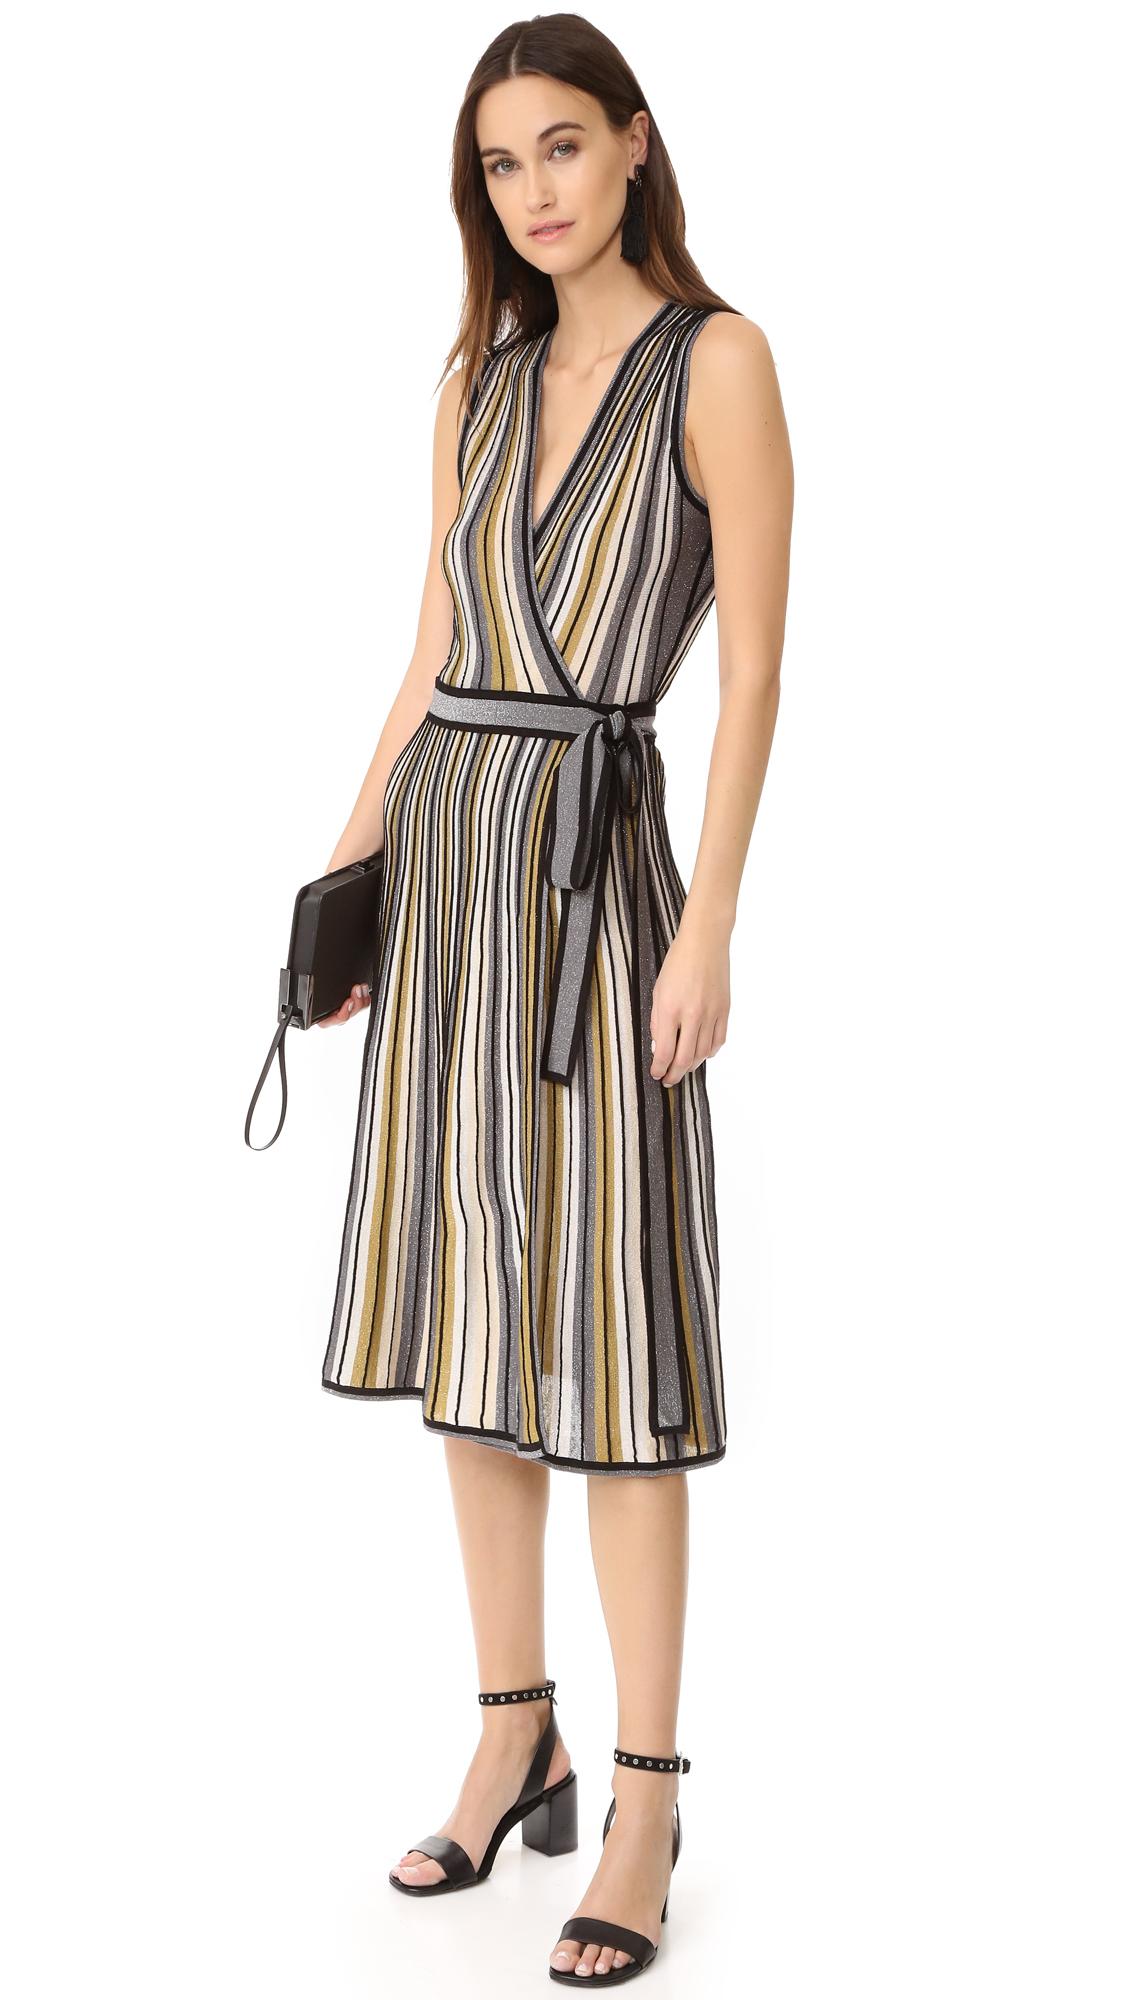 The wrap dress dvf - The Wrap Dress Dvf 59